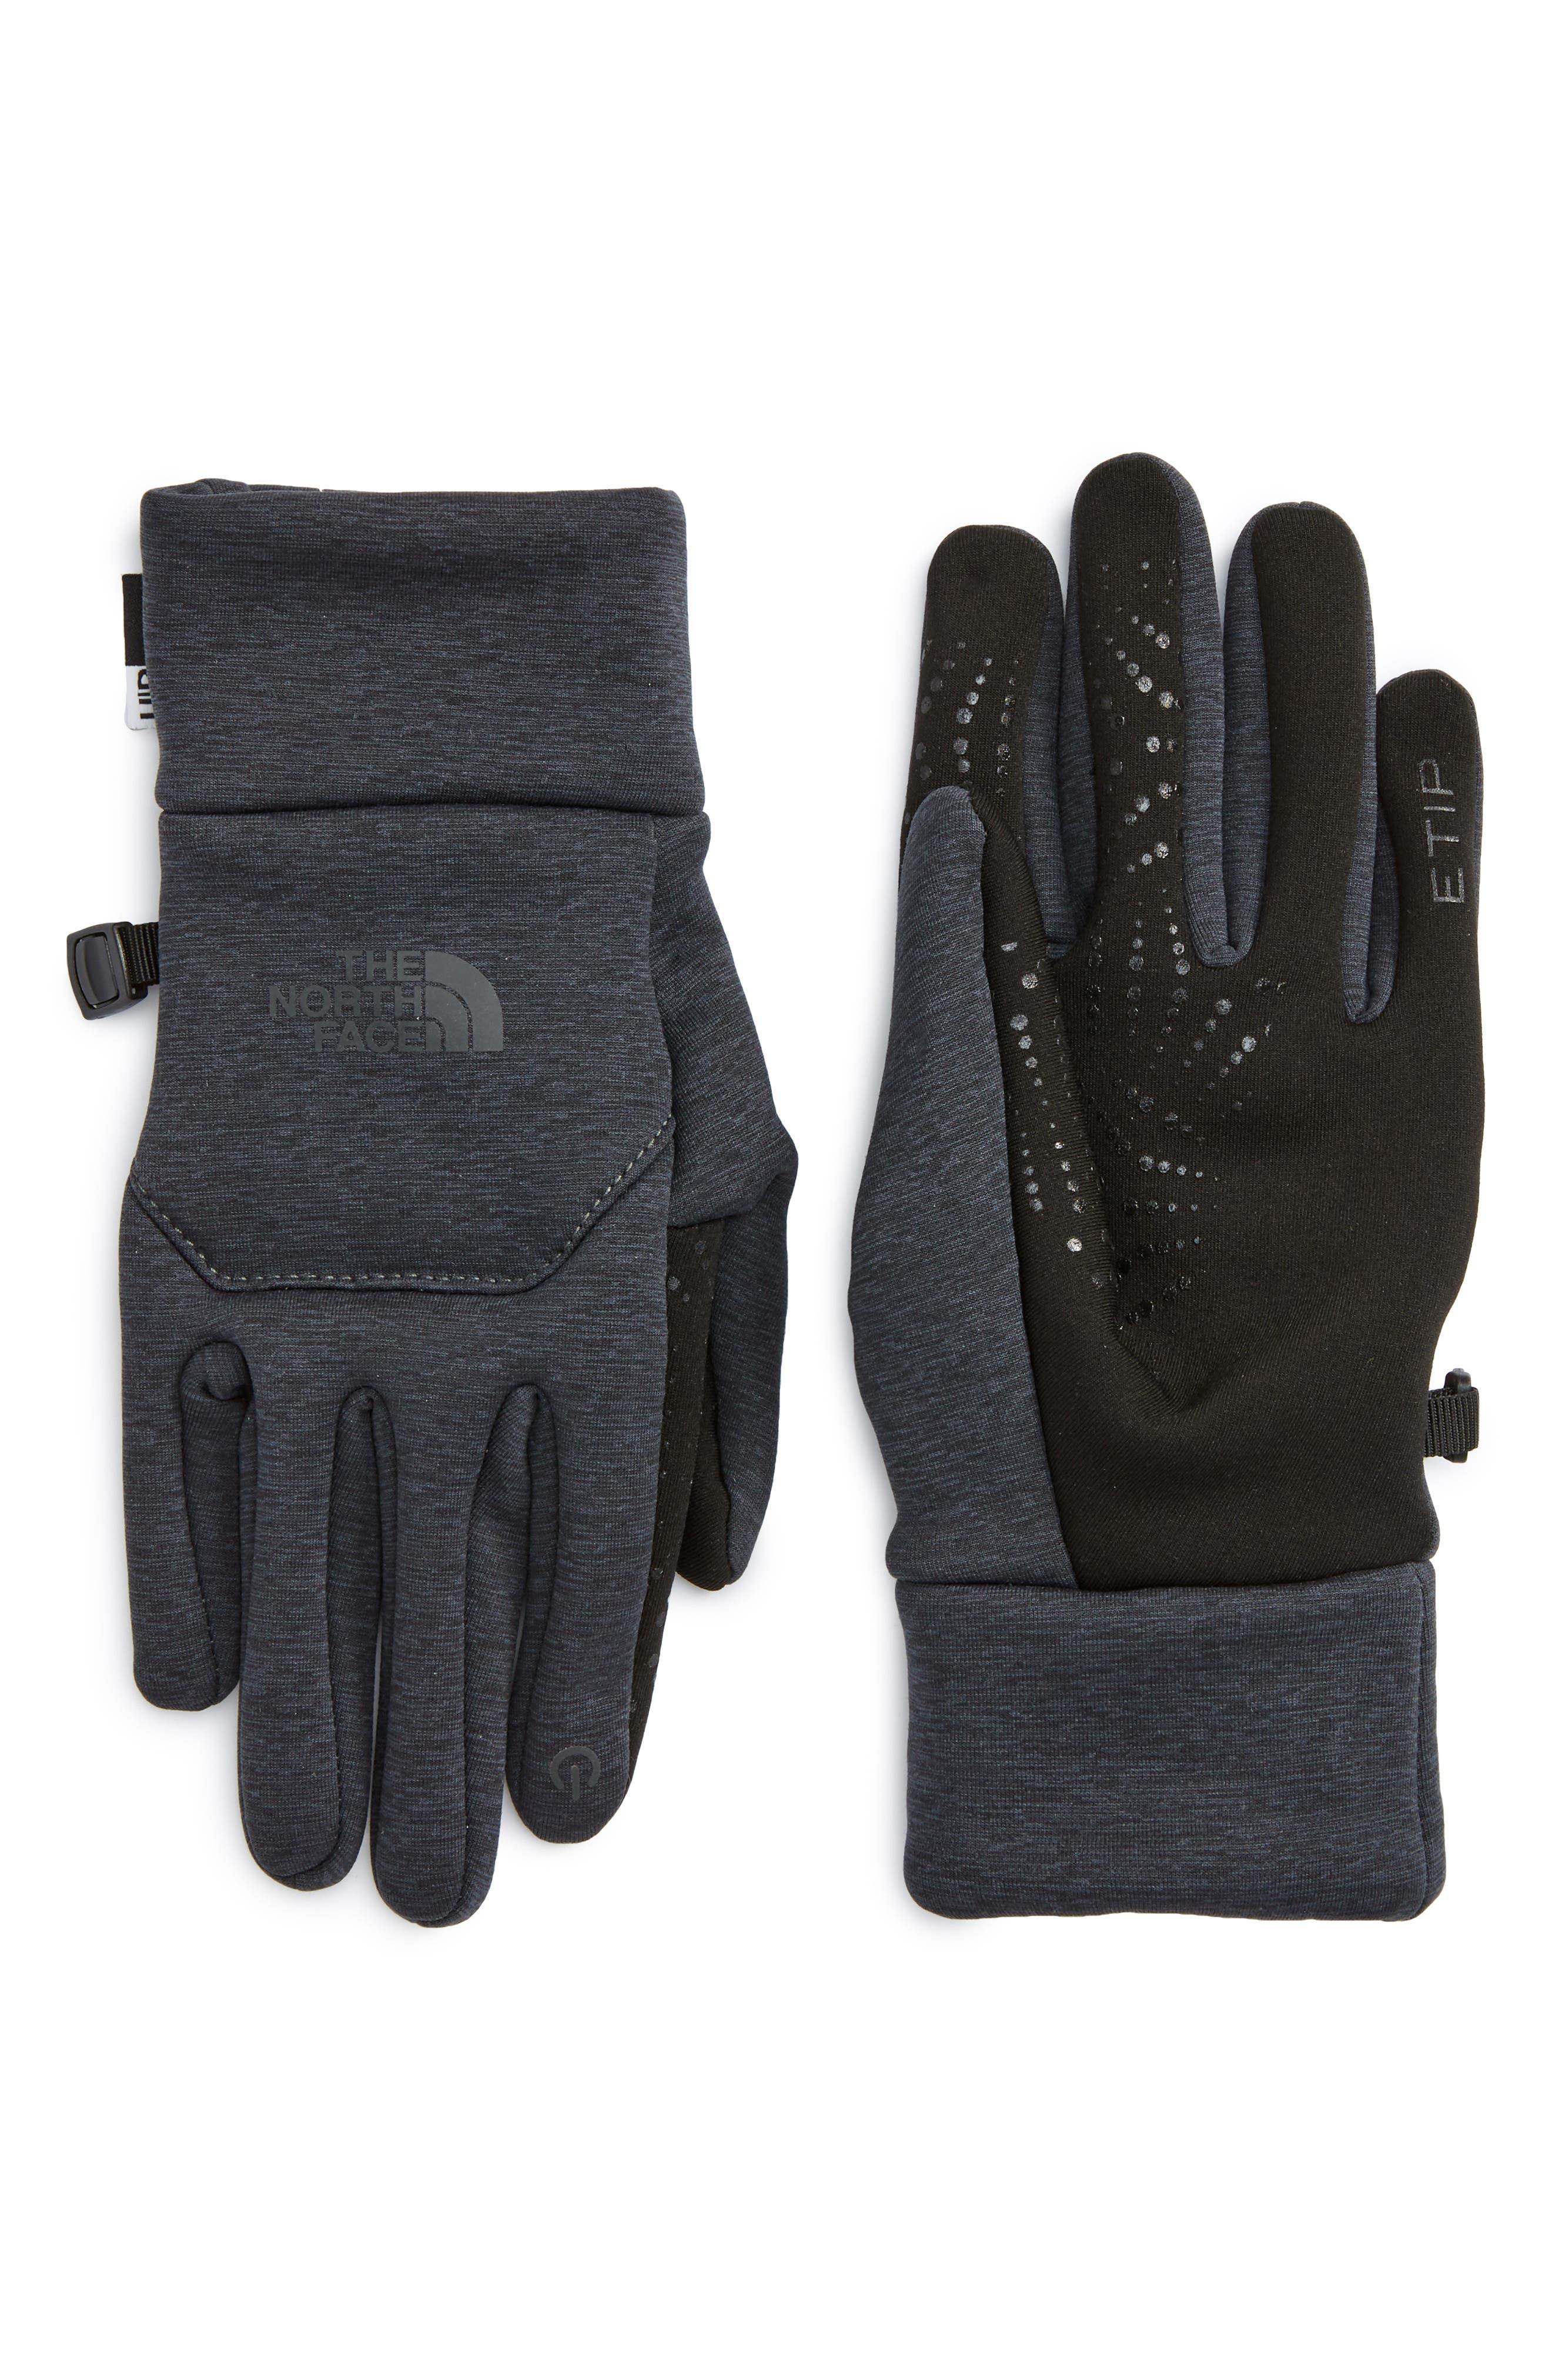 Etip Gloves,                         Main,                         color, Asphalt Grey Heather Print